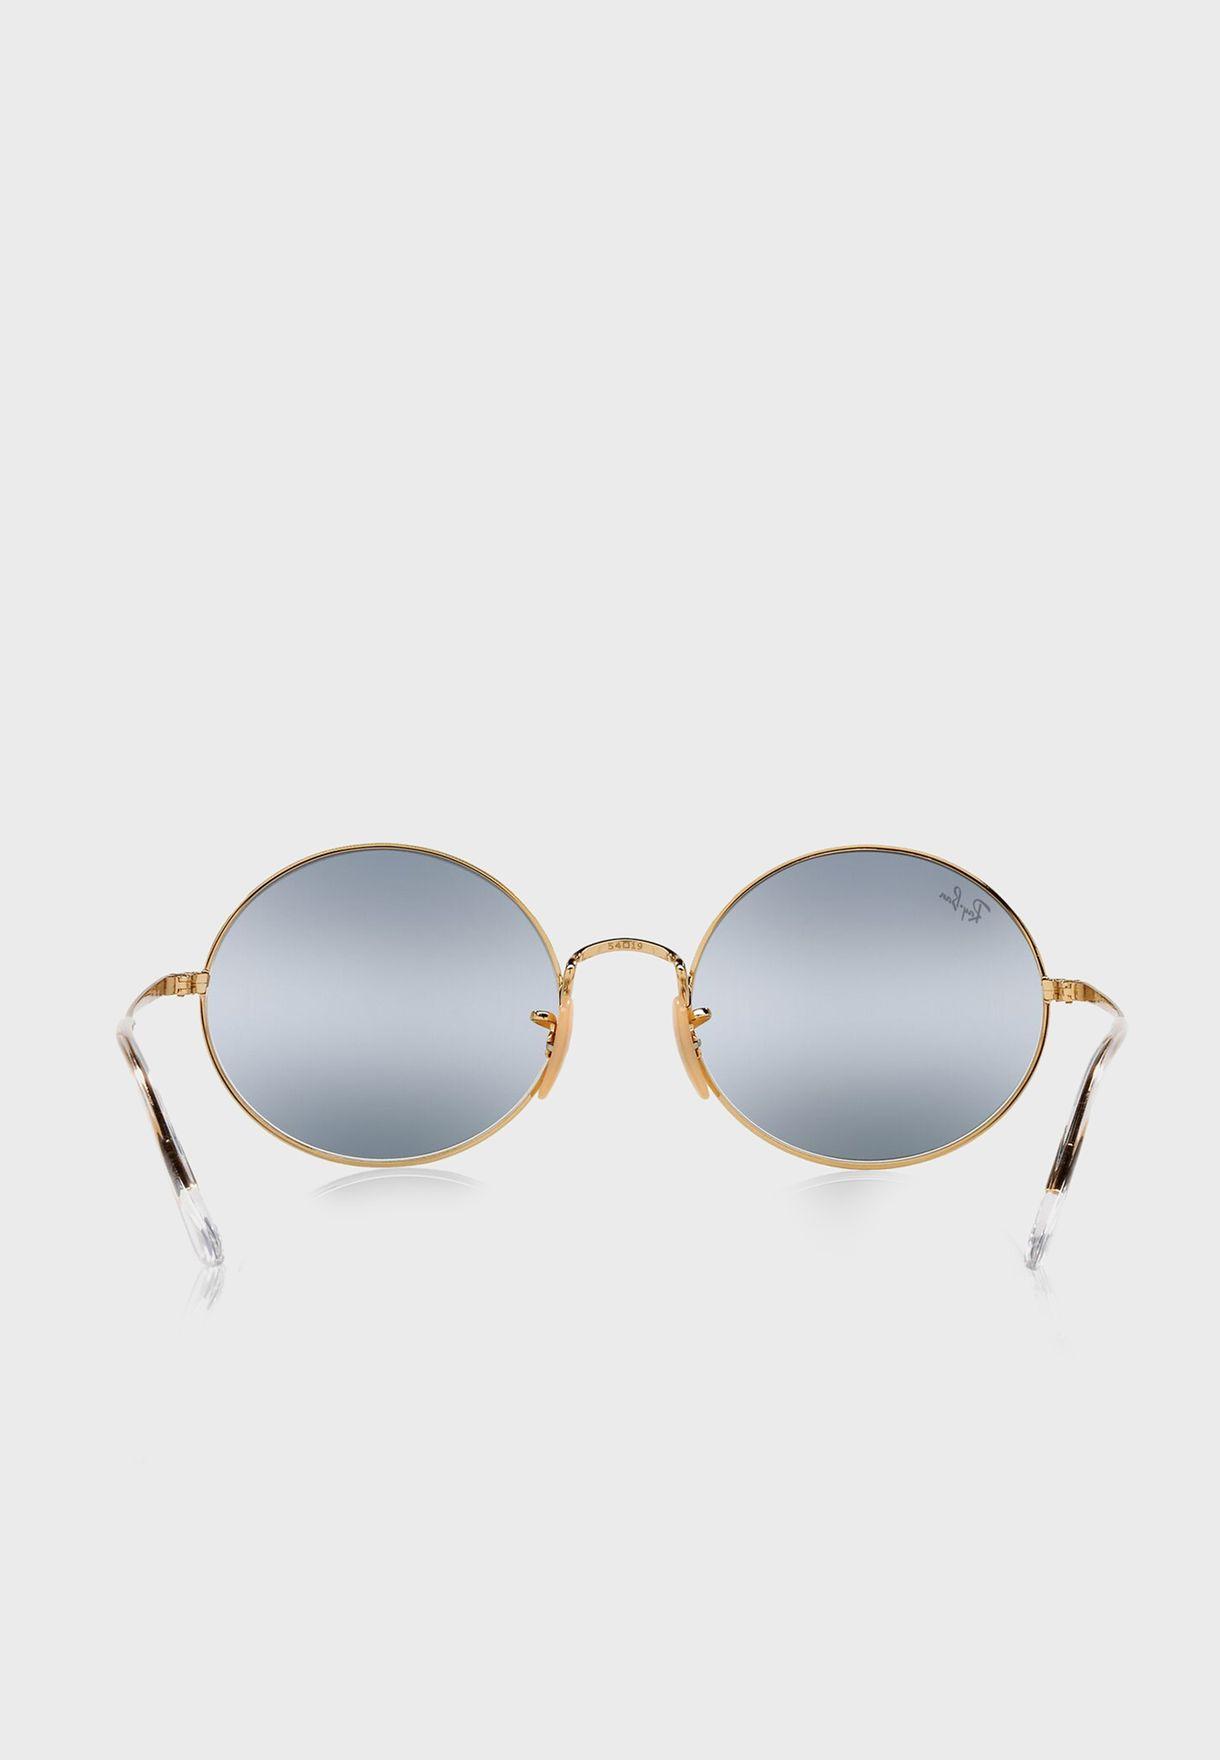 0Rb1970 Round Sunglasses